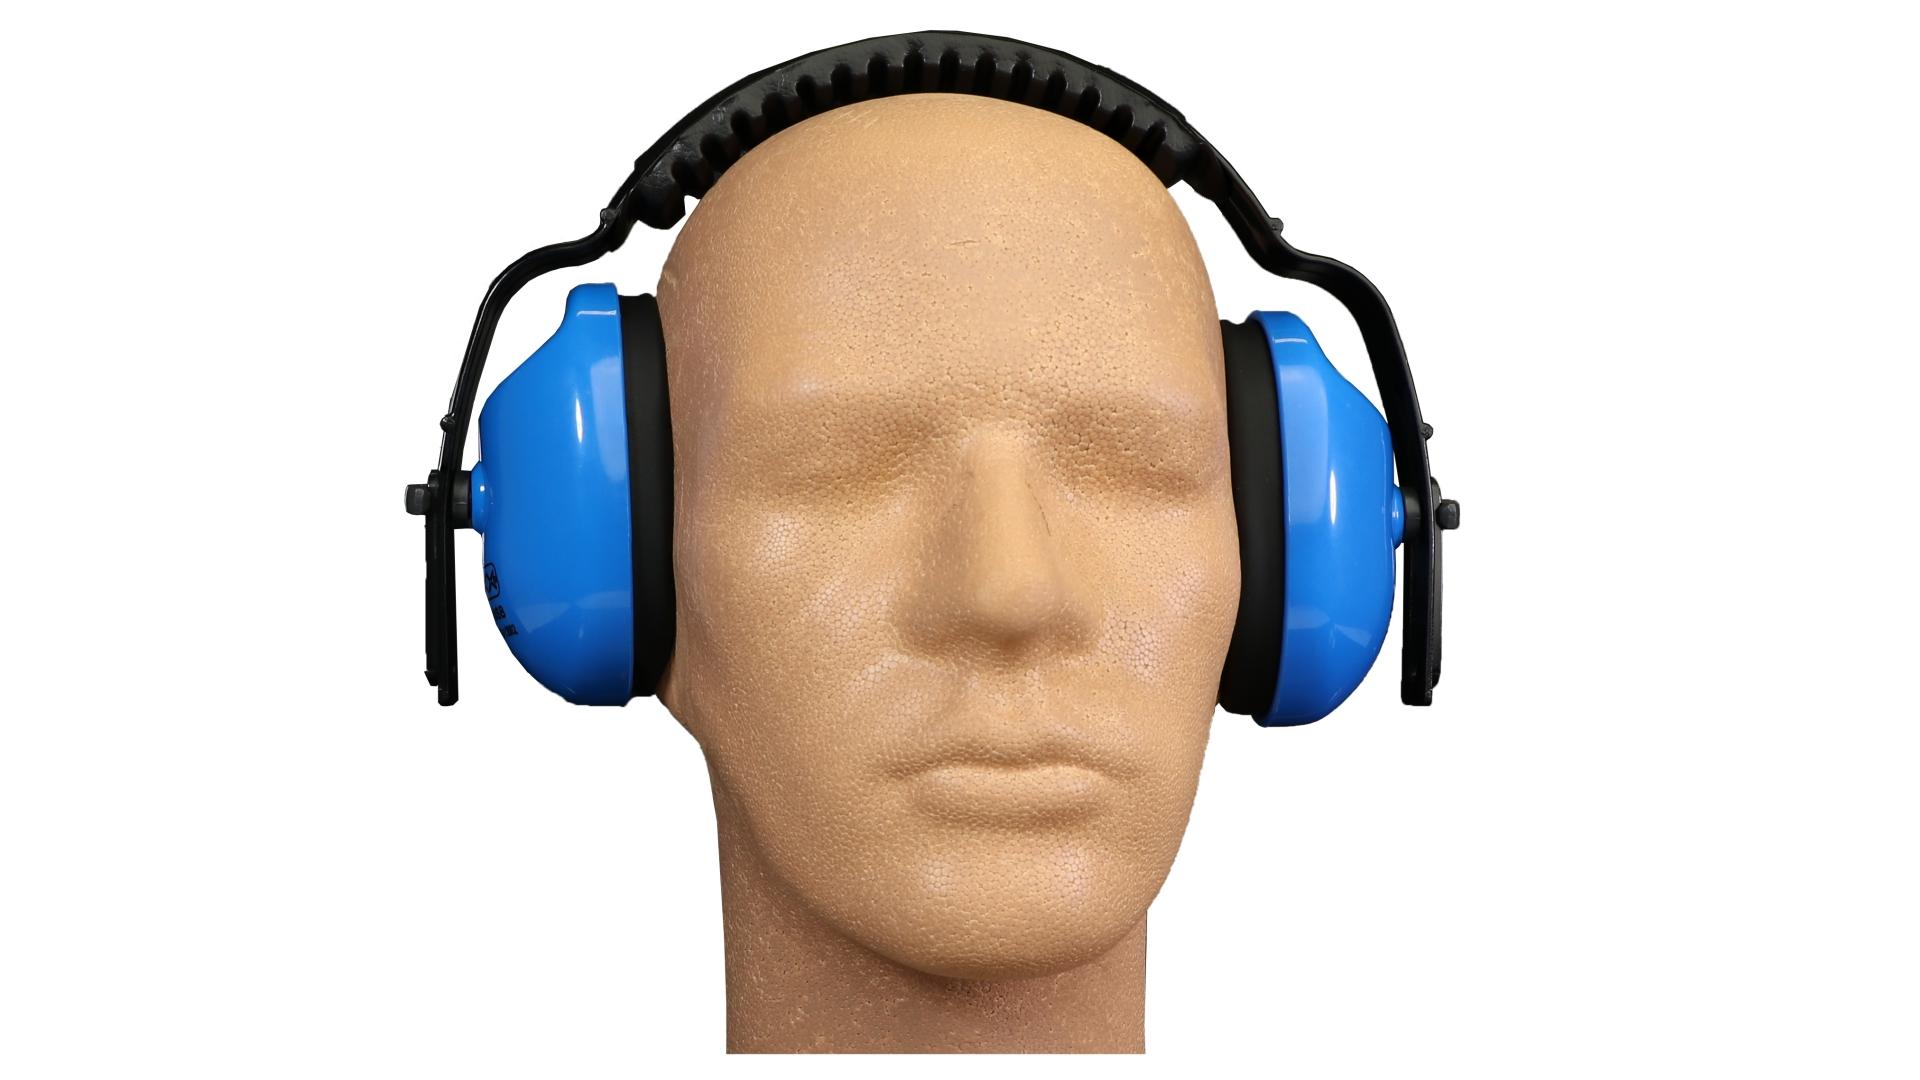 L+D Kapselgehörschutz 23 dB, Standard-Profi-Qualität, Universalgröße, Zulassung nach EN 352-1, blau